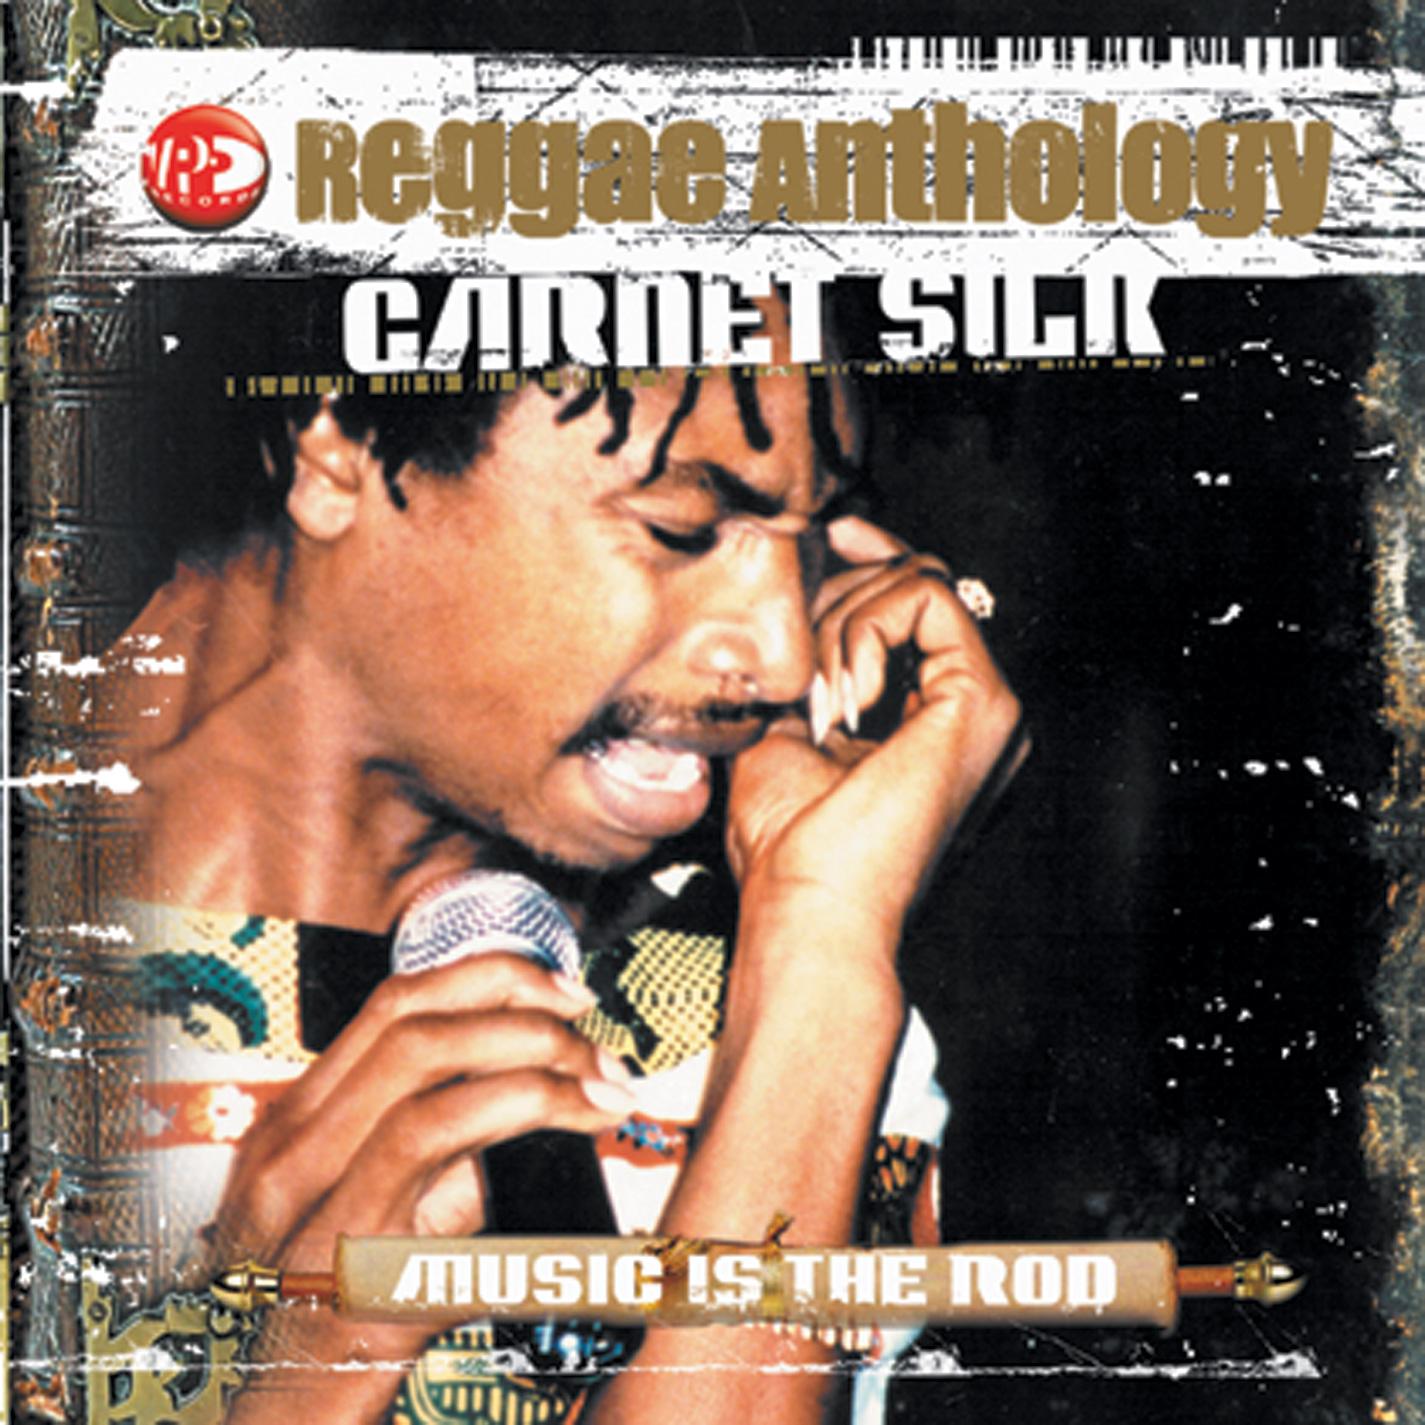 Garnett Silk Garnet Silk Love Me Or Leave Me